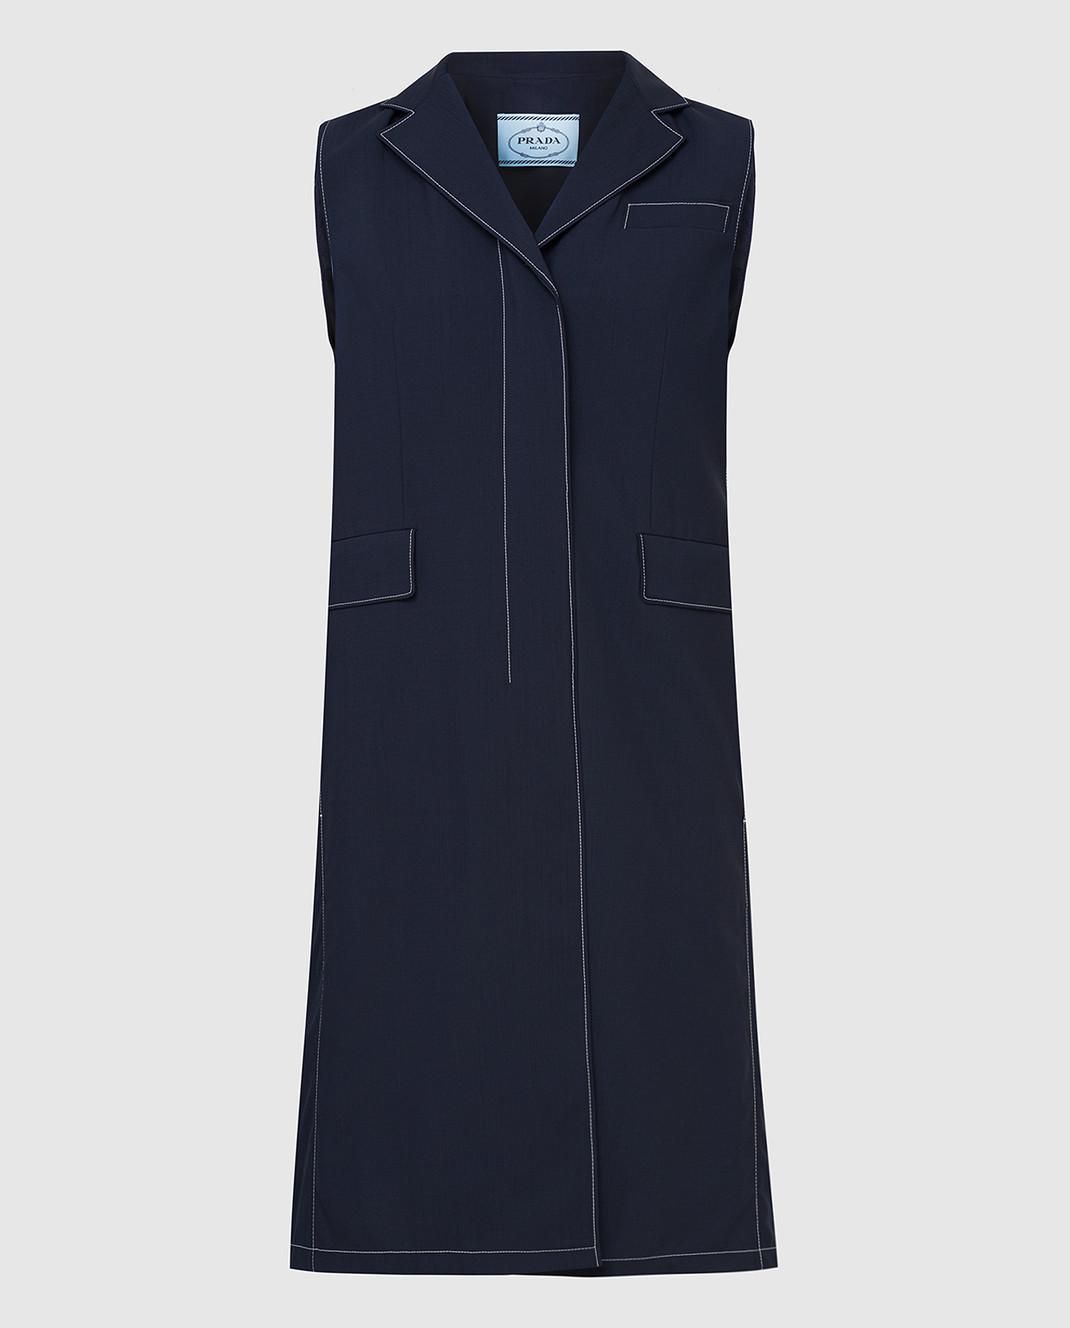 Prada Темно-синий жилет из шерсти P604E